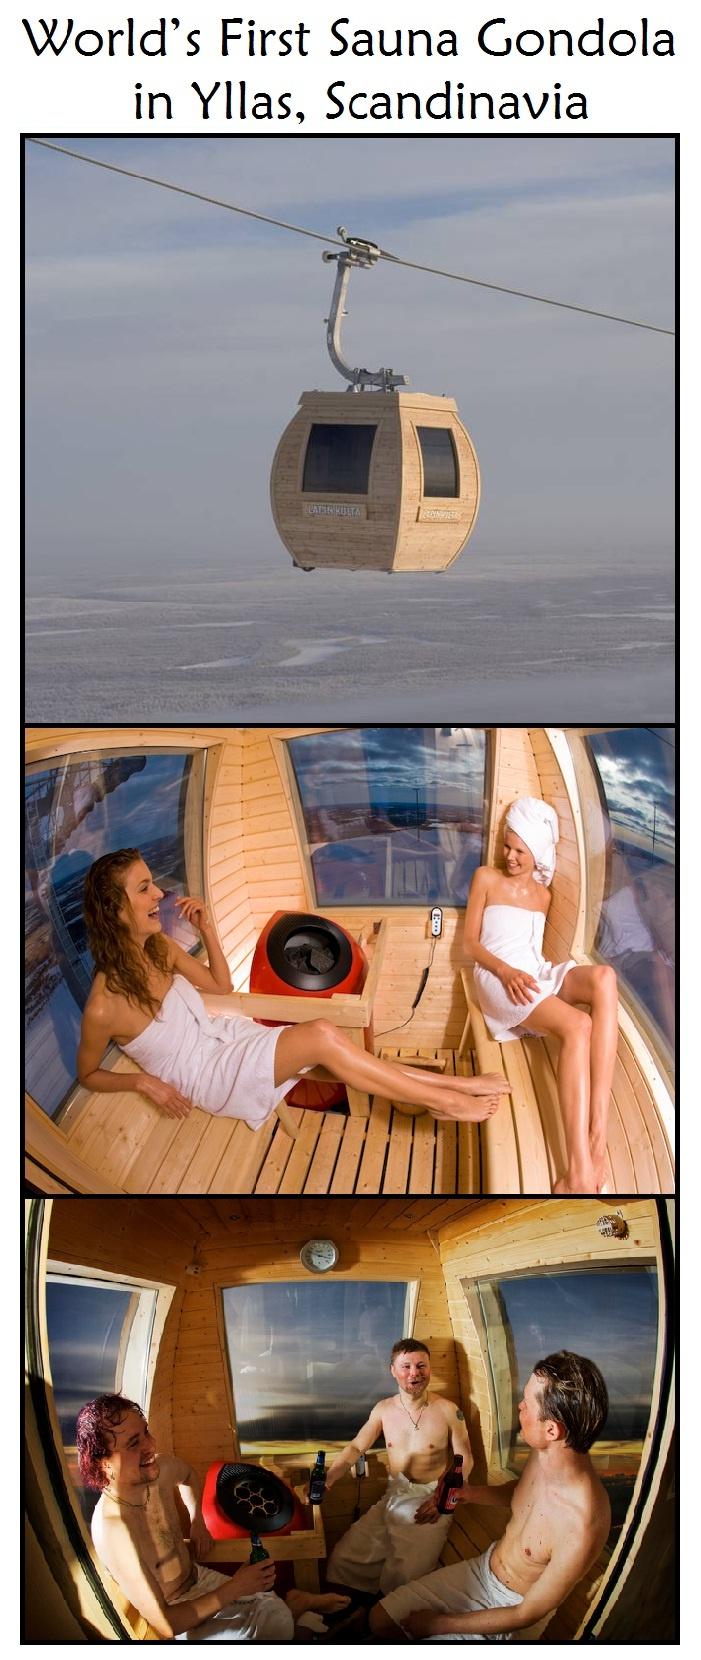 Sauna Gondola in Ylläs, Finnish Lapland